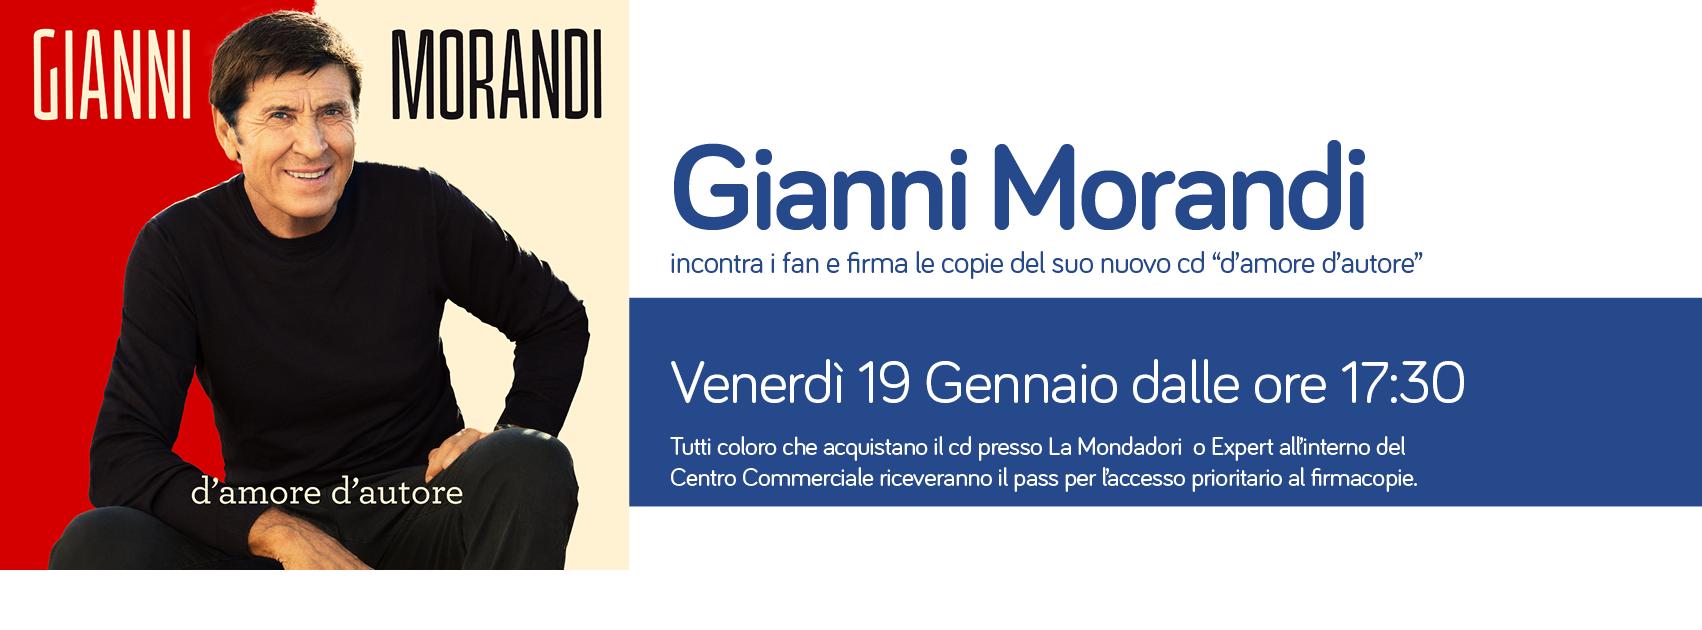 Gianni Morandi incontra i suoi fan